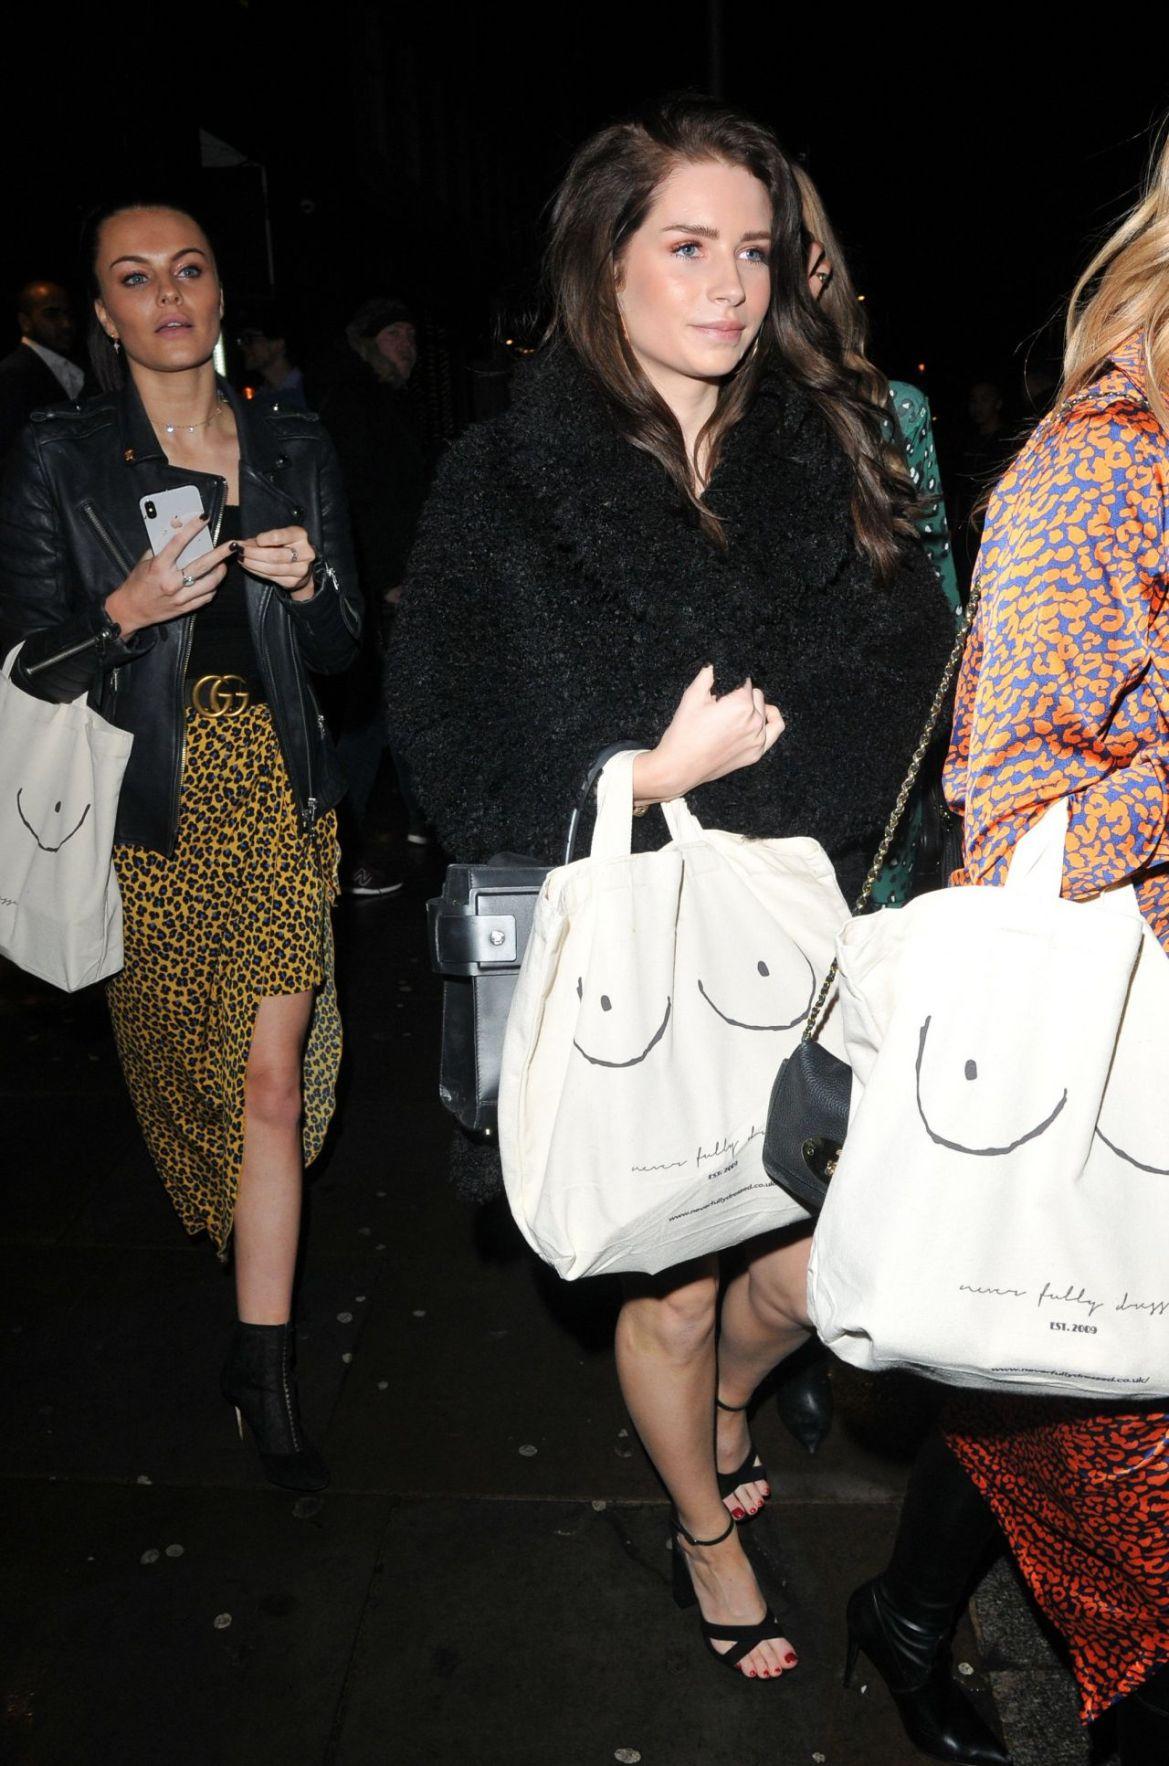 Lottie Moss – Arrives at The Never Fully Dressed VIP Festive Dinner in Londo